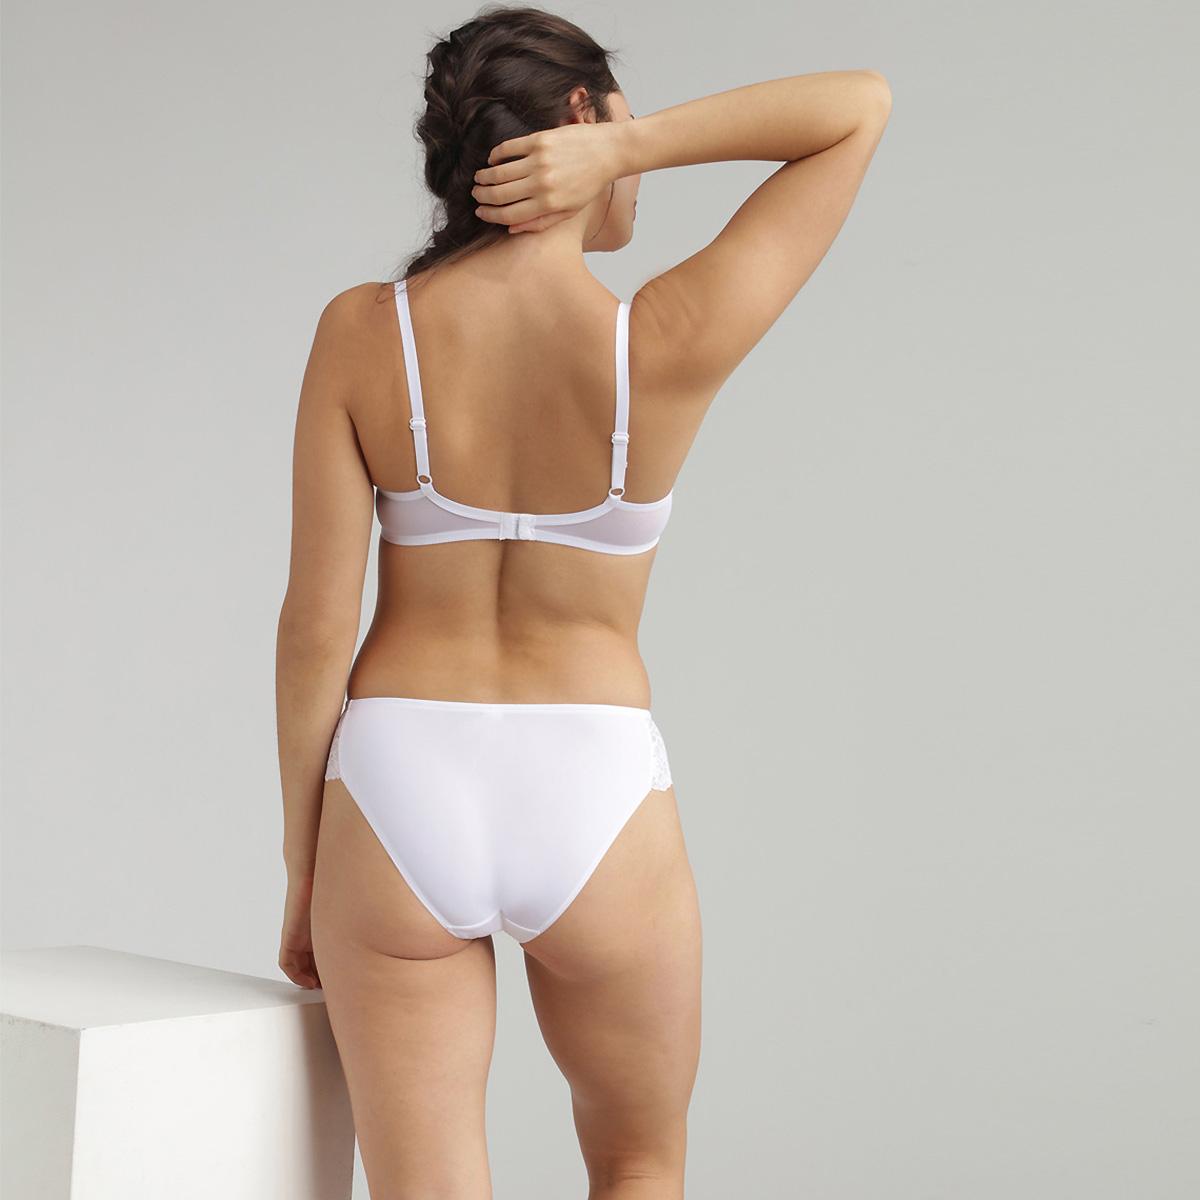 Underwired Lace Bra in White Essential Elegance, , PLAYTEX